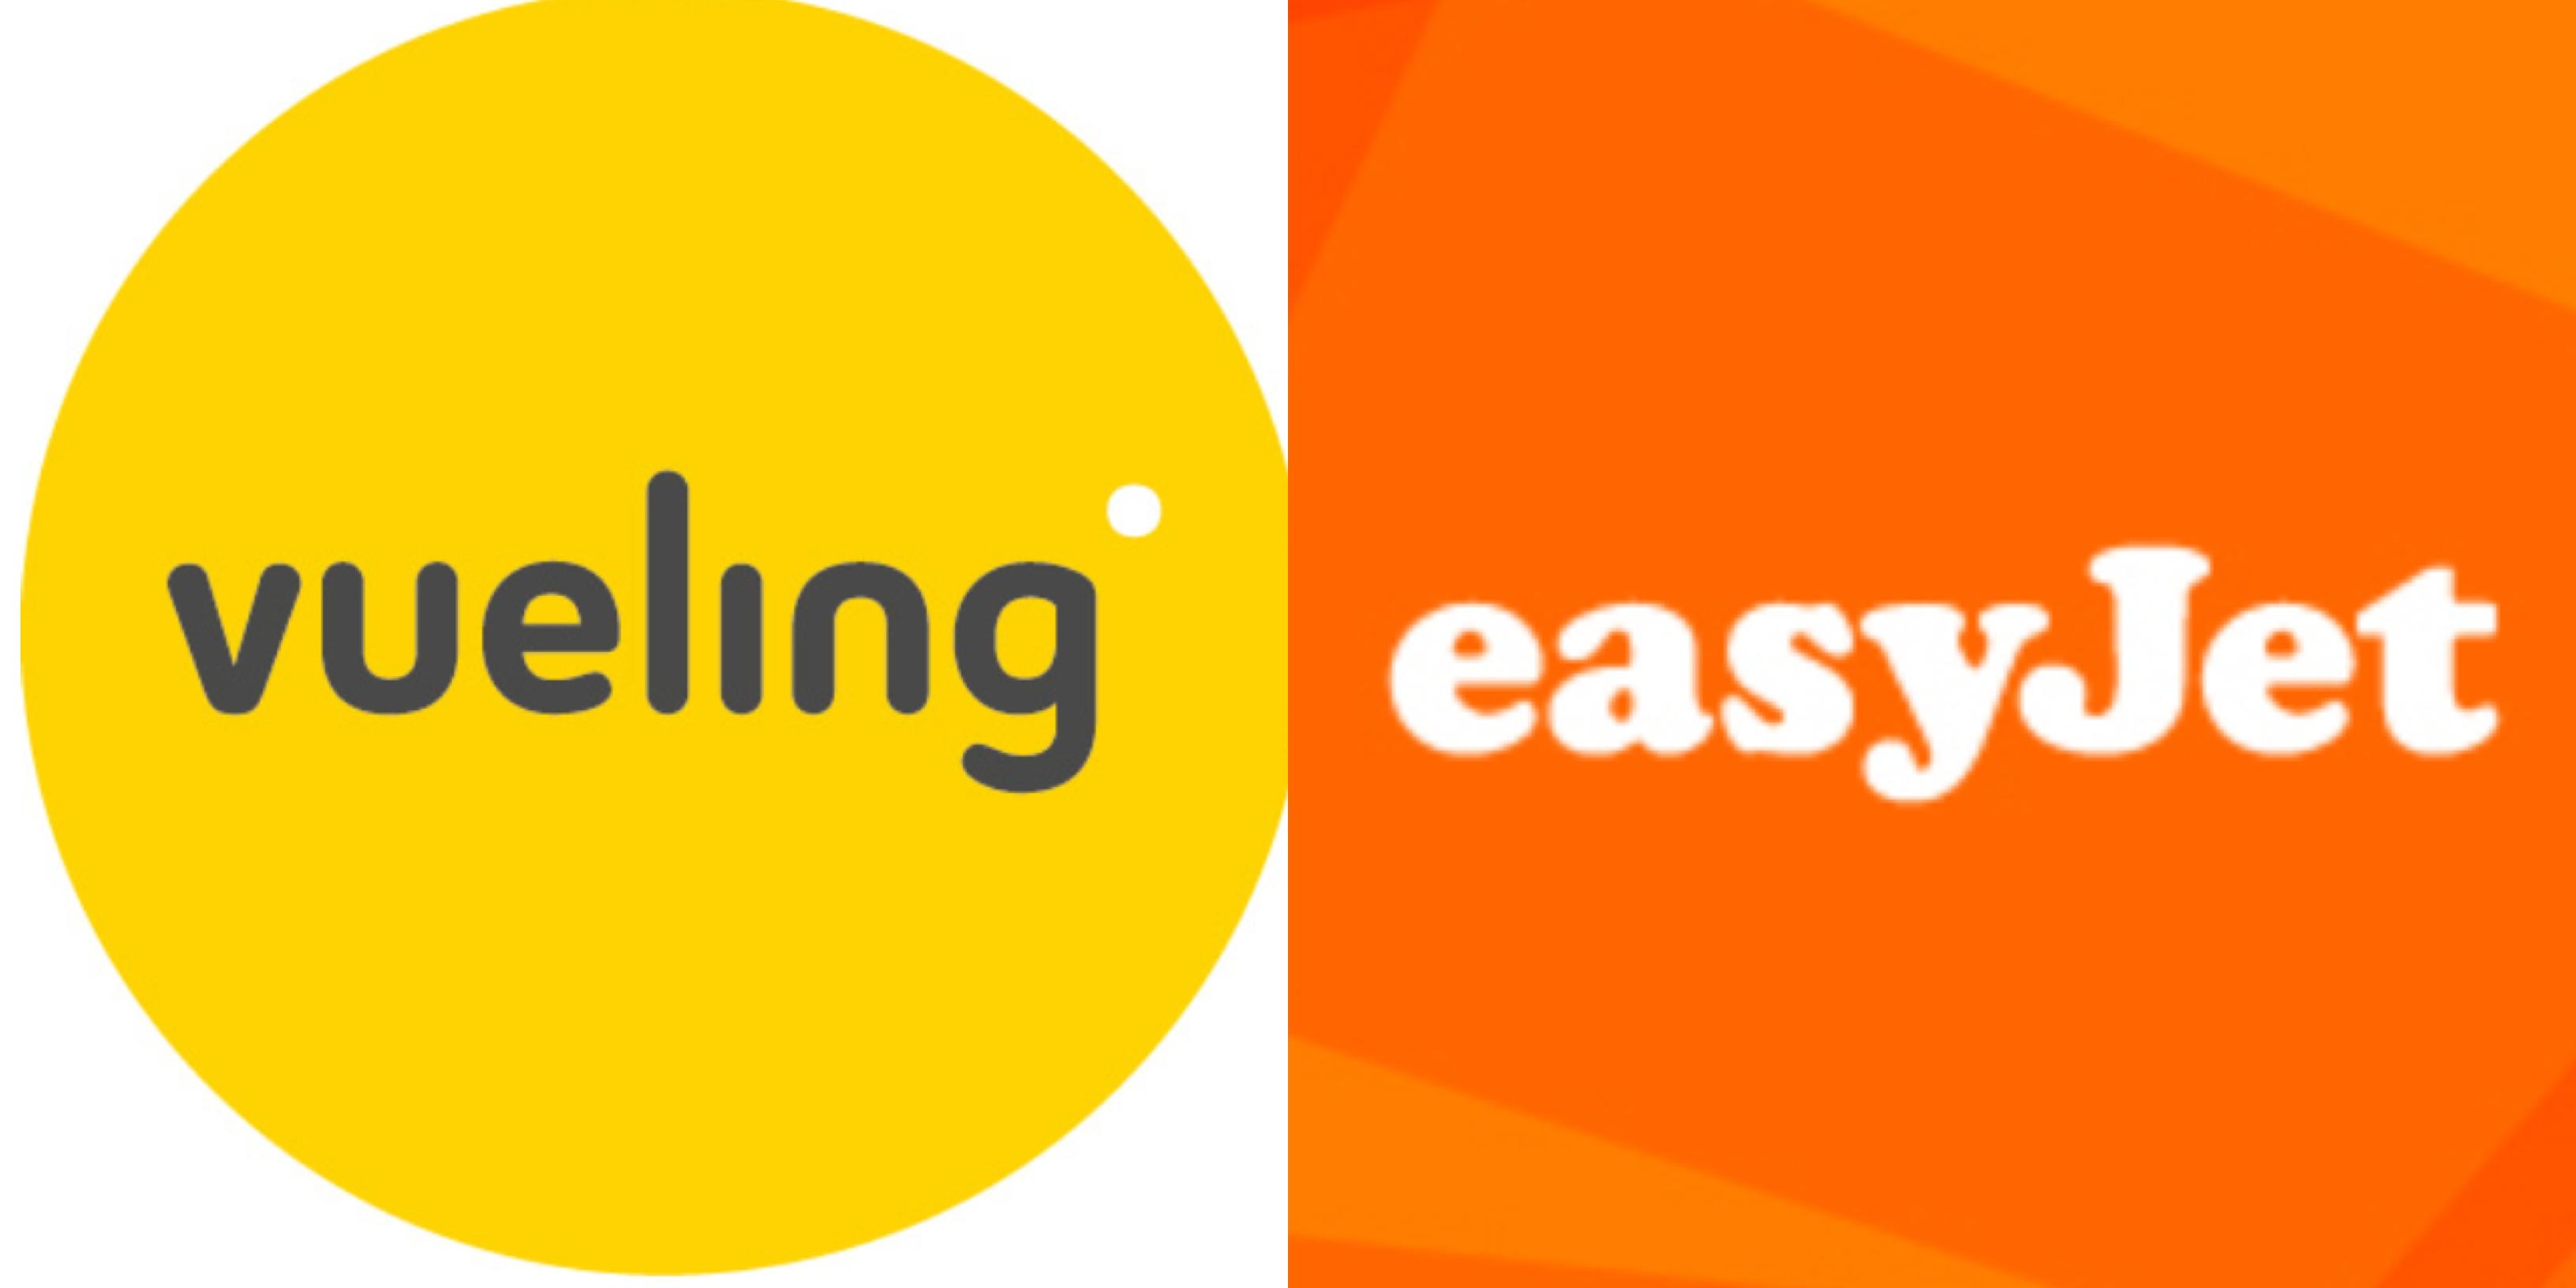 Vueling Logo Airlines Logonoidcom - Vueling Logo Vector PNG